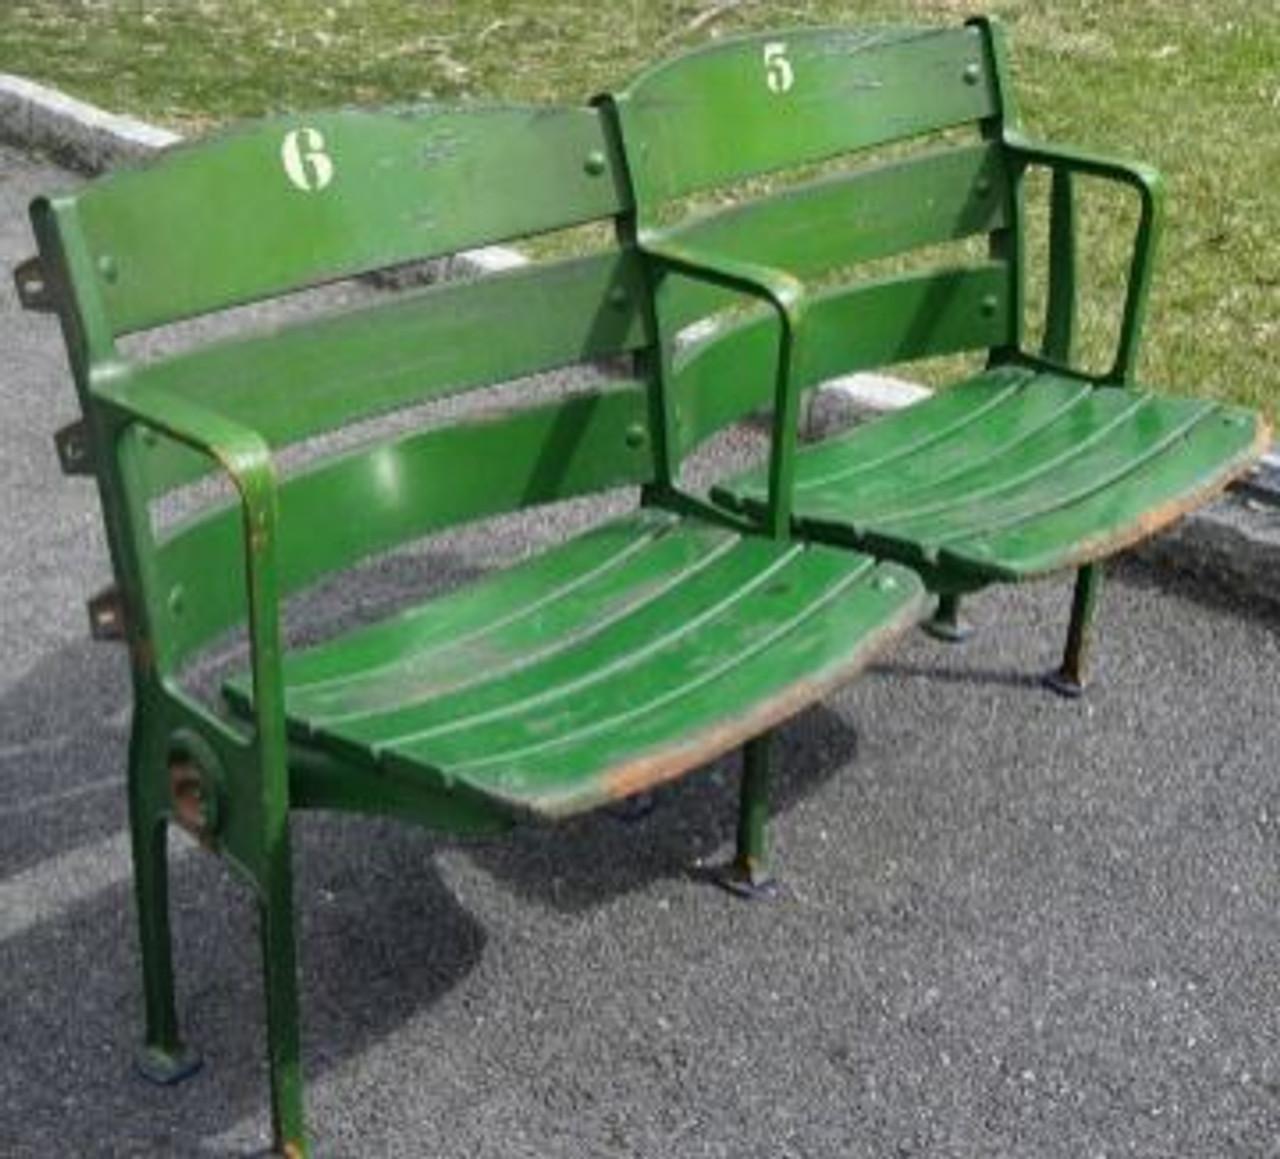 Polo Grounds Free Standing Box Seats - New York Giants